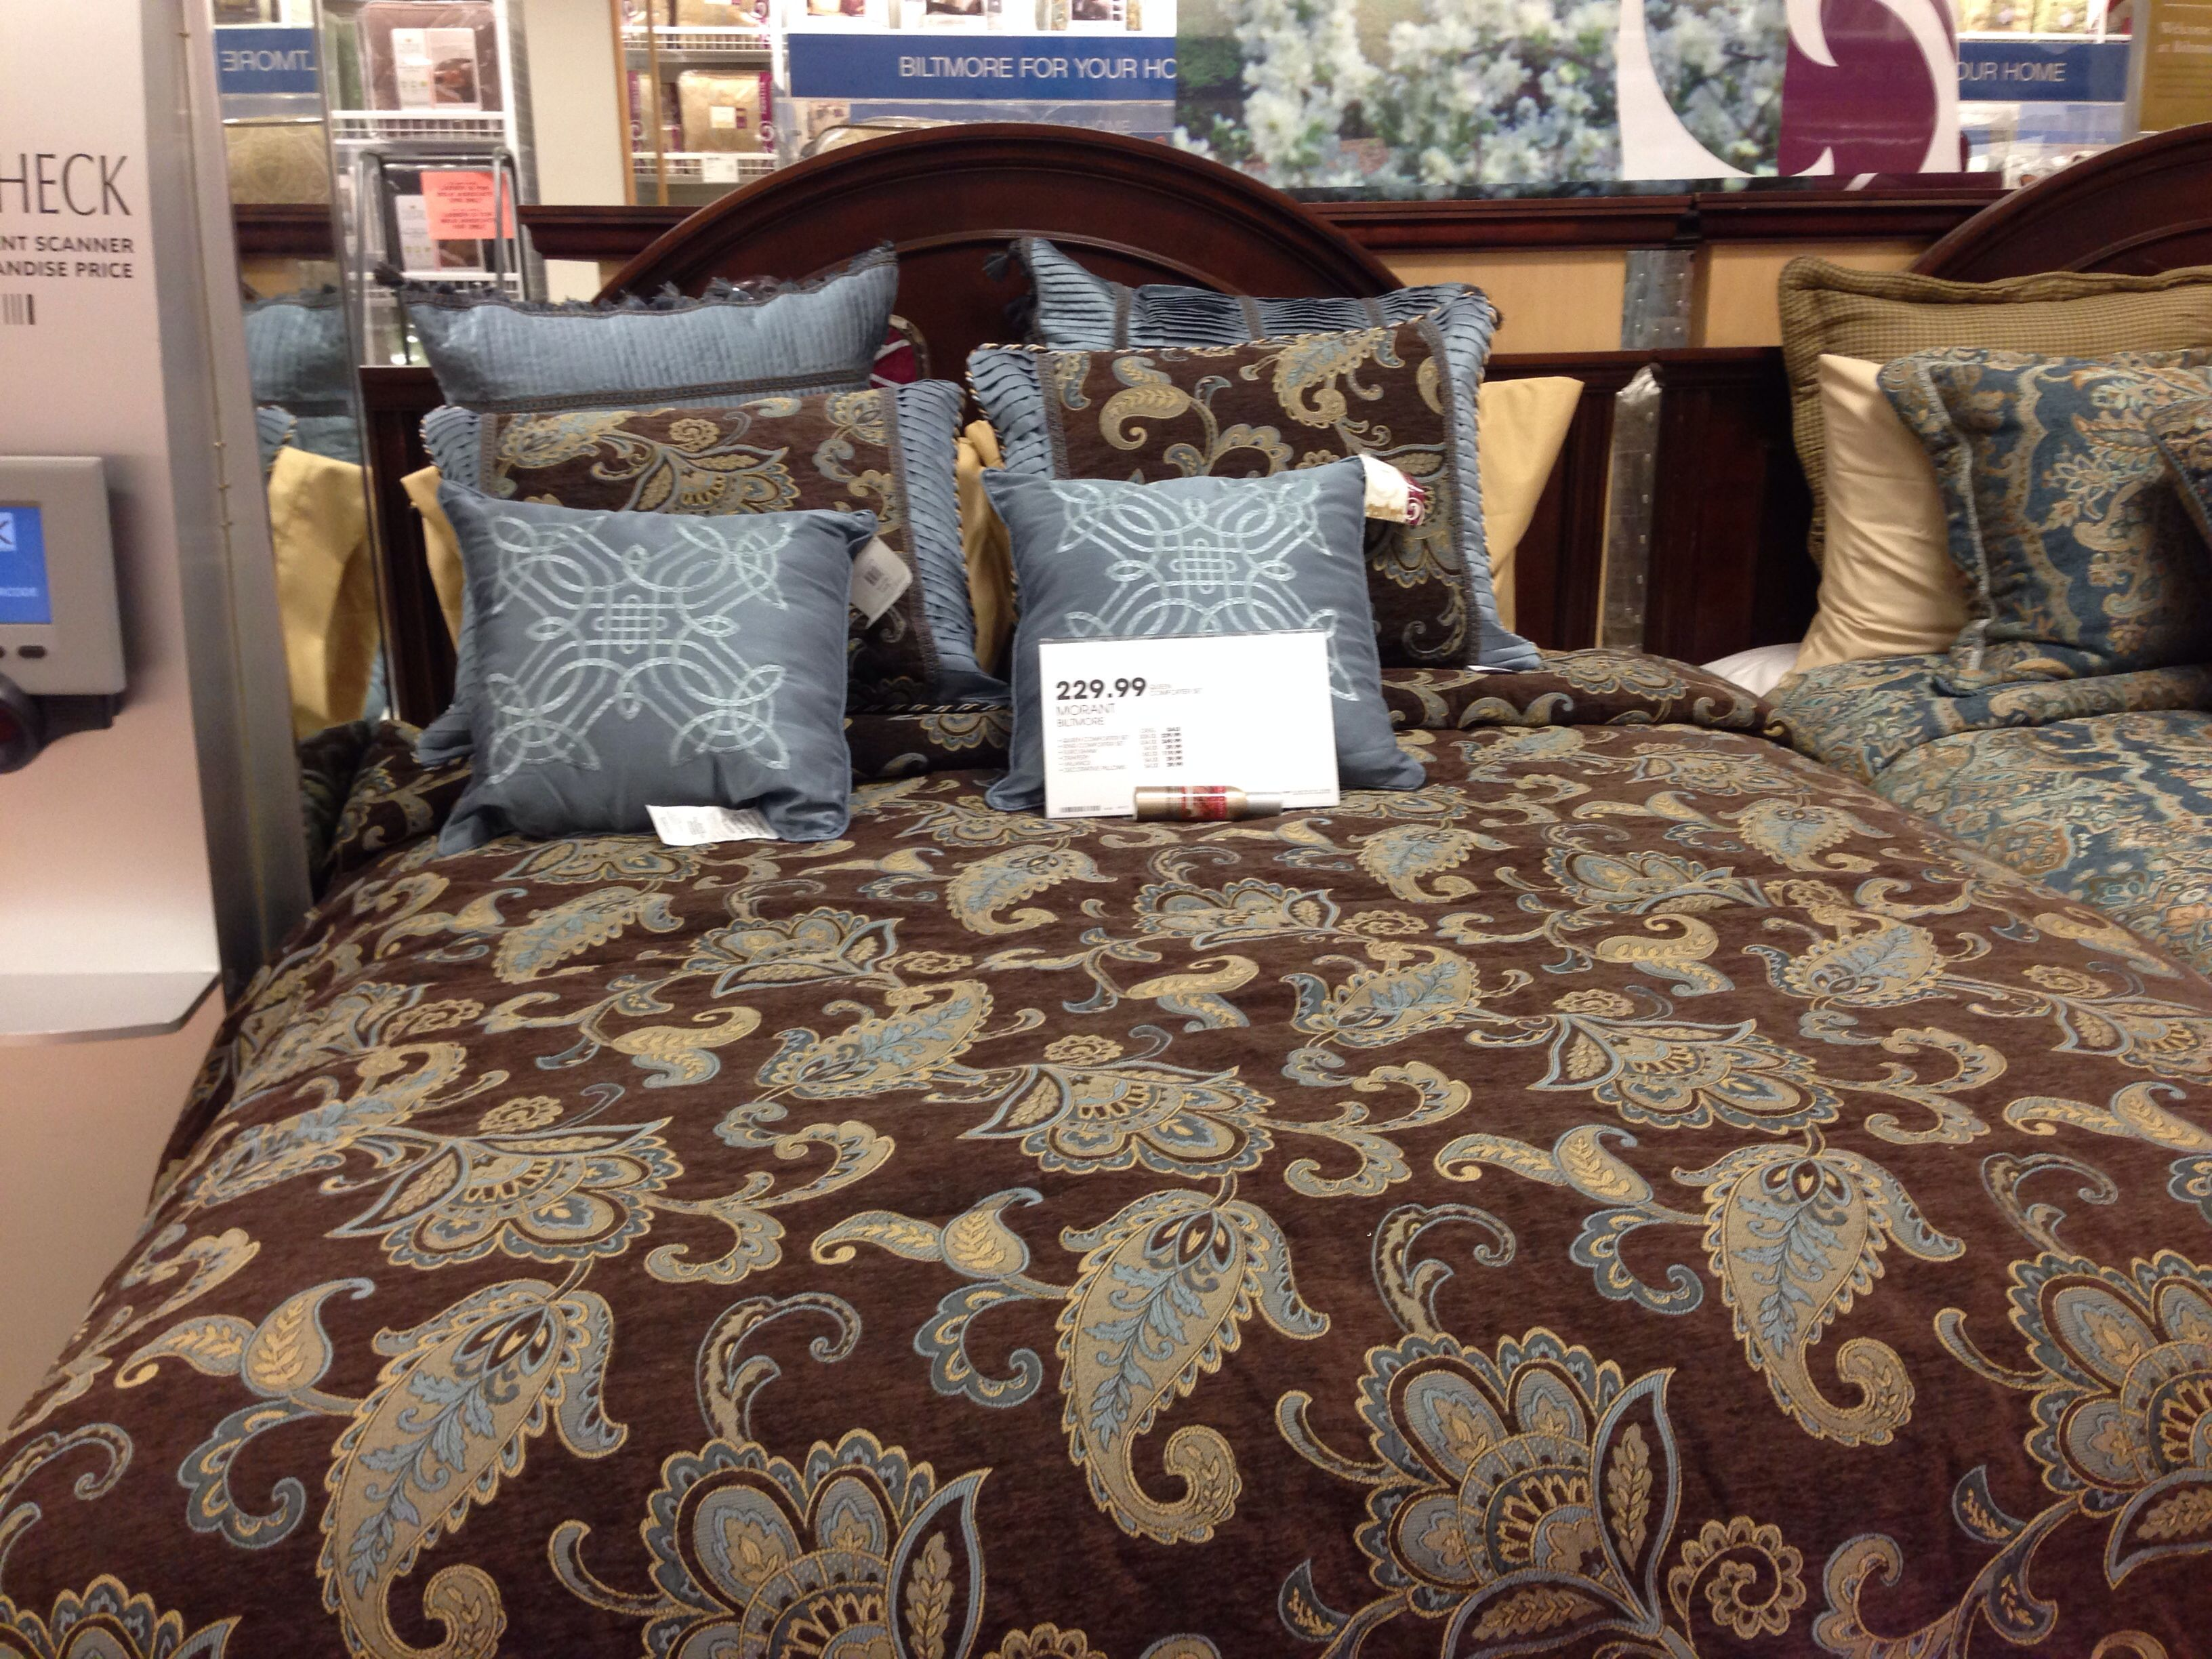 biltmore bedding at belk | wish list | pinterest | master bedroom